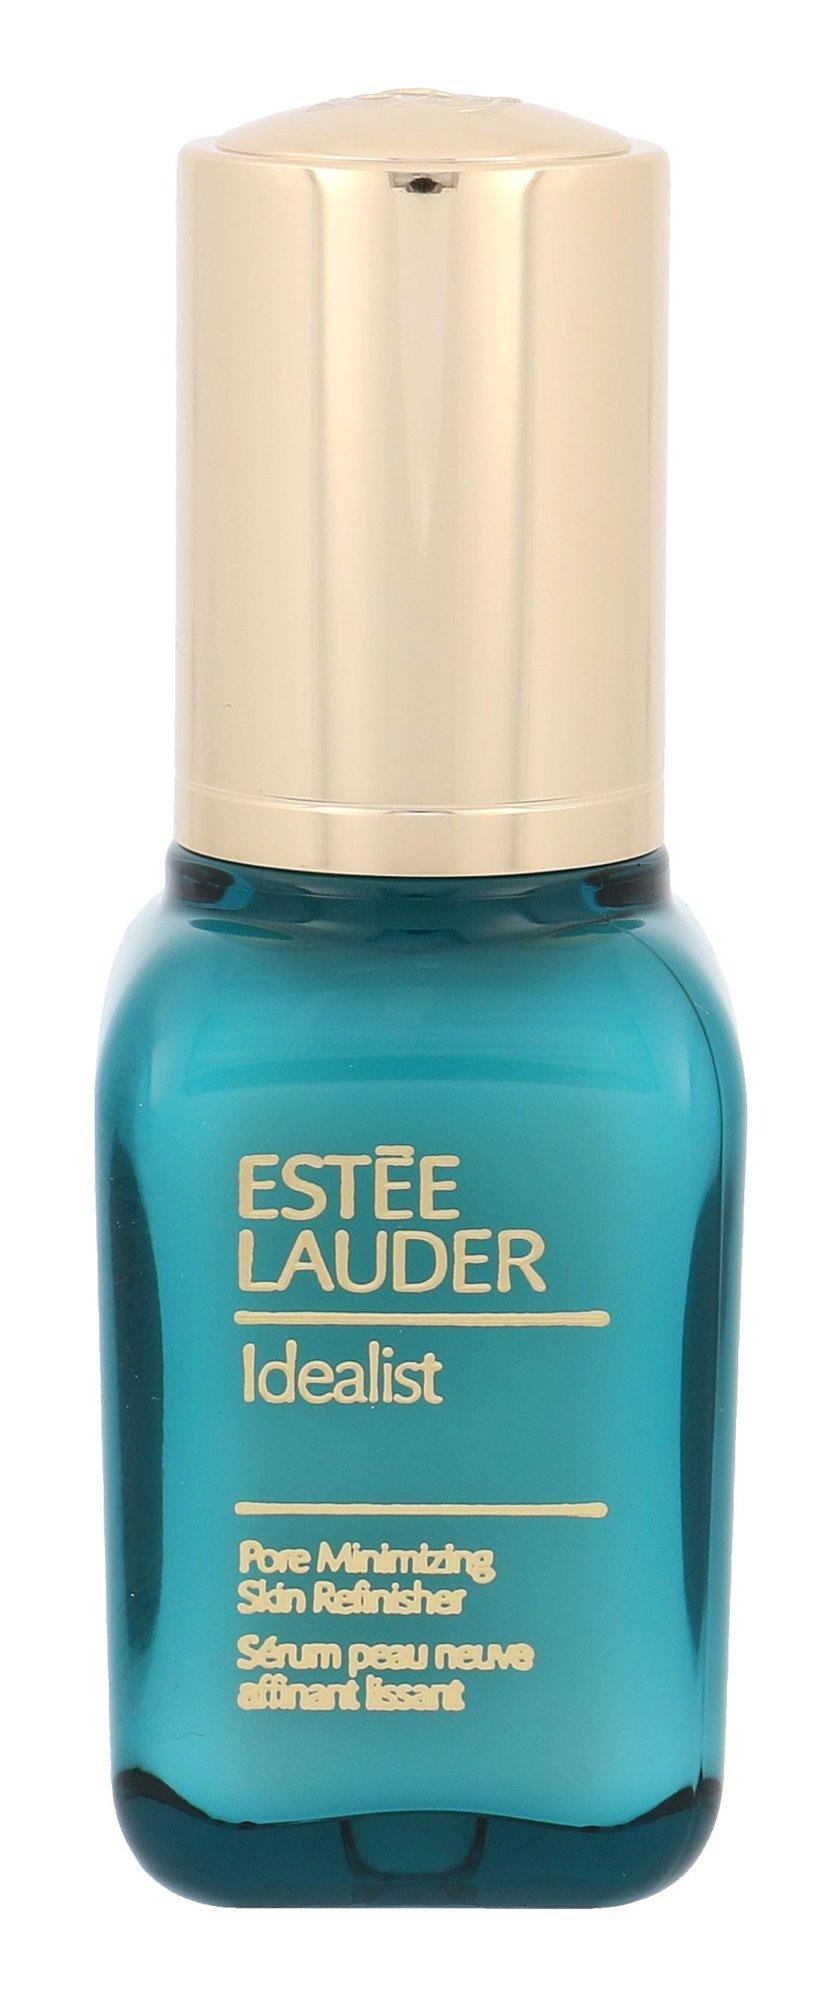 Estée Lauder Idealist Cosmetic 30ml